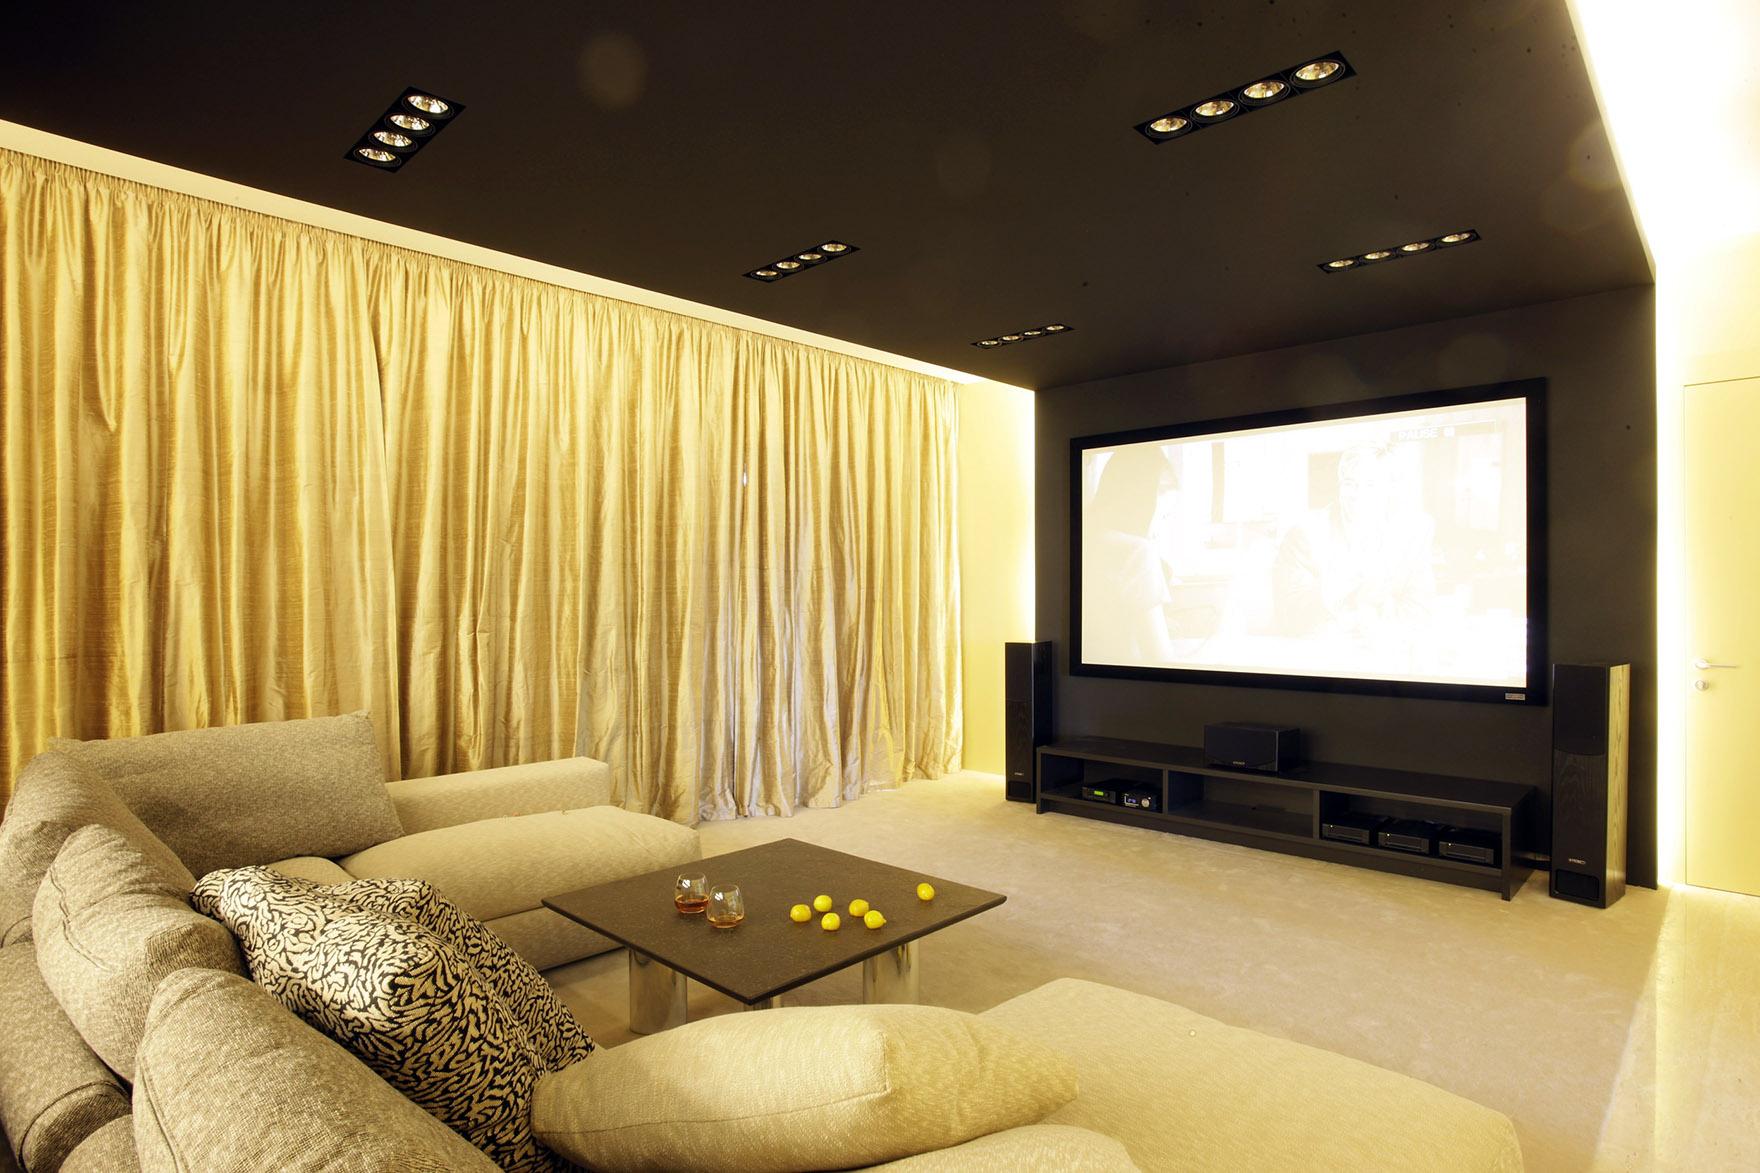 Квартира «», домашний кинотеатр, фото из проекта